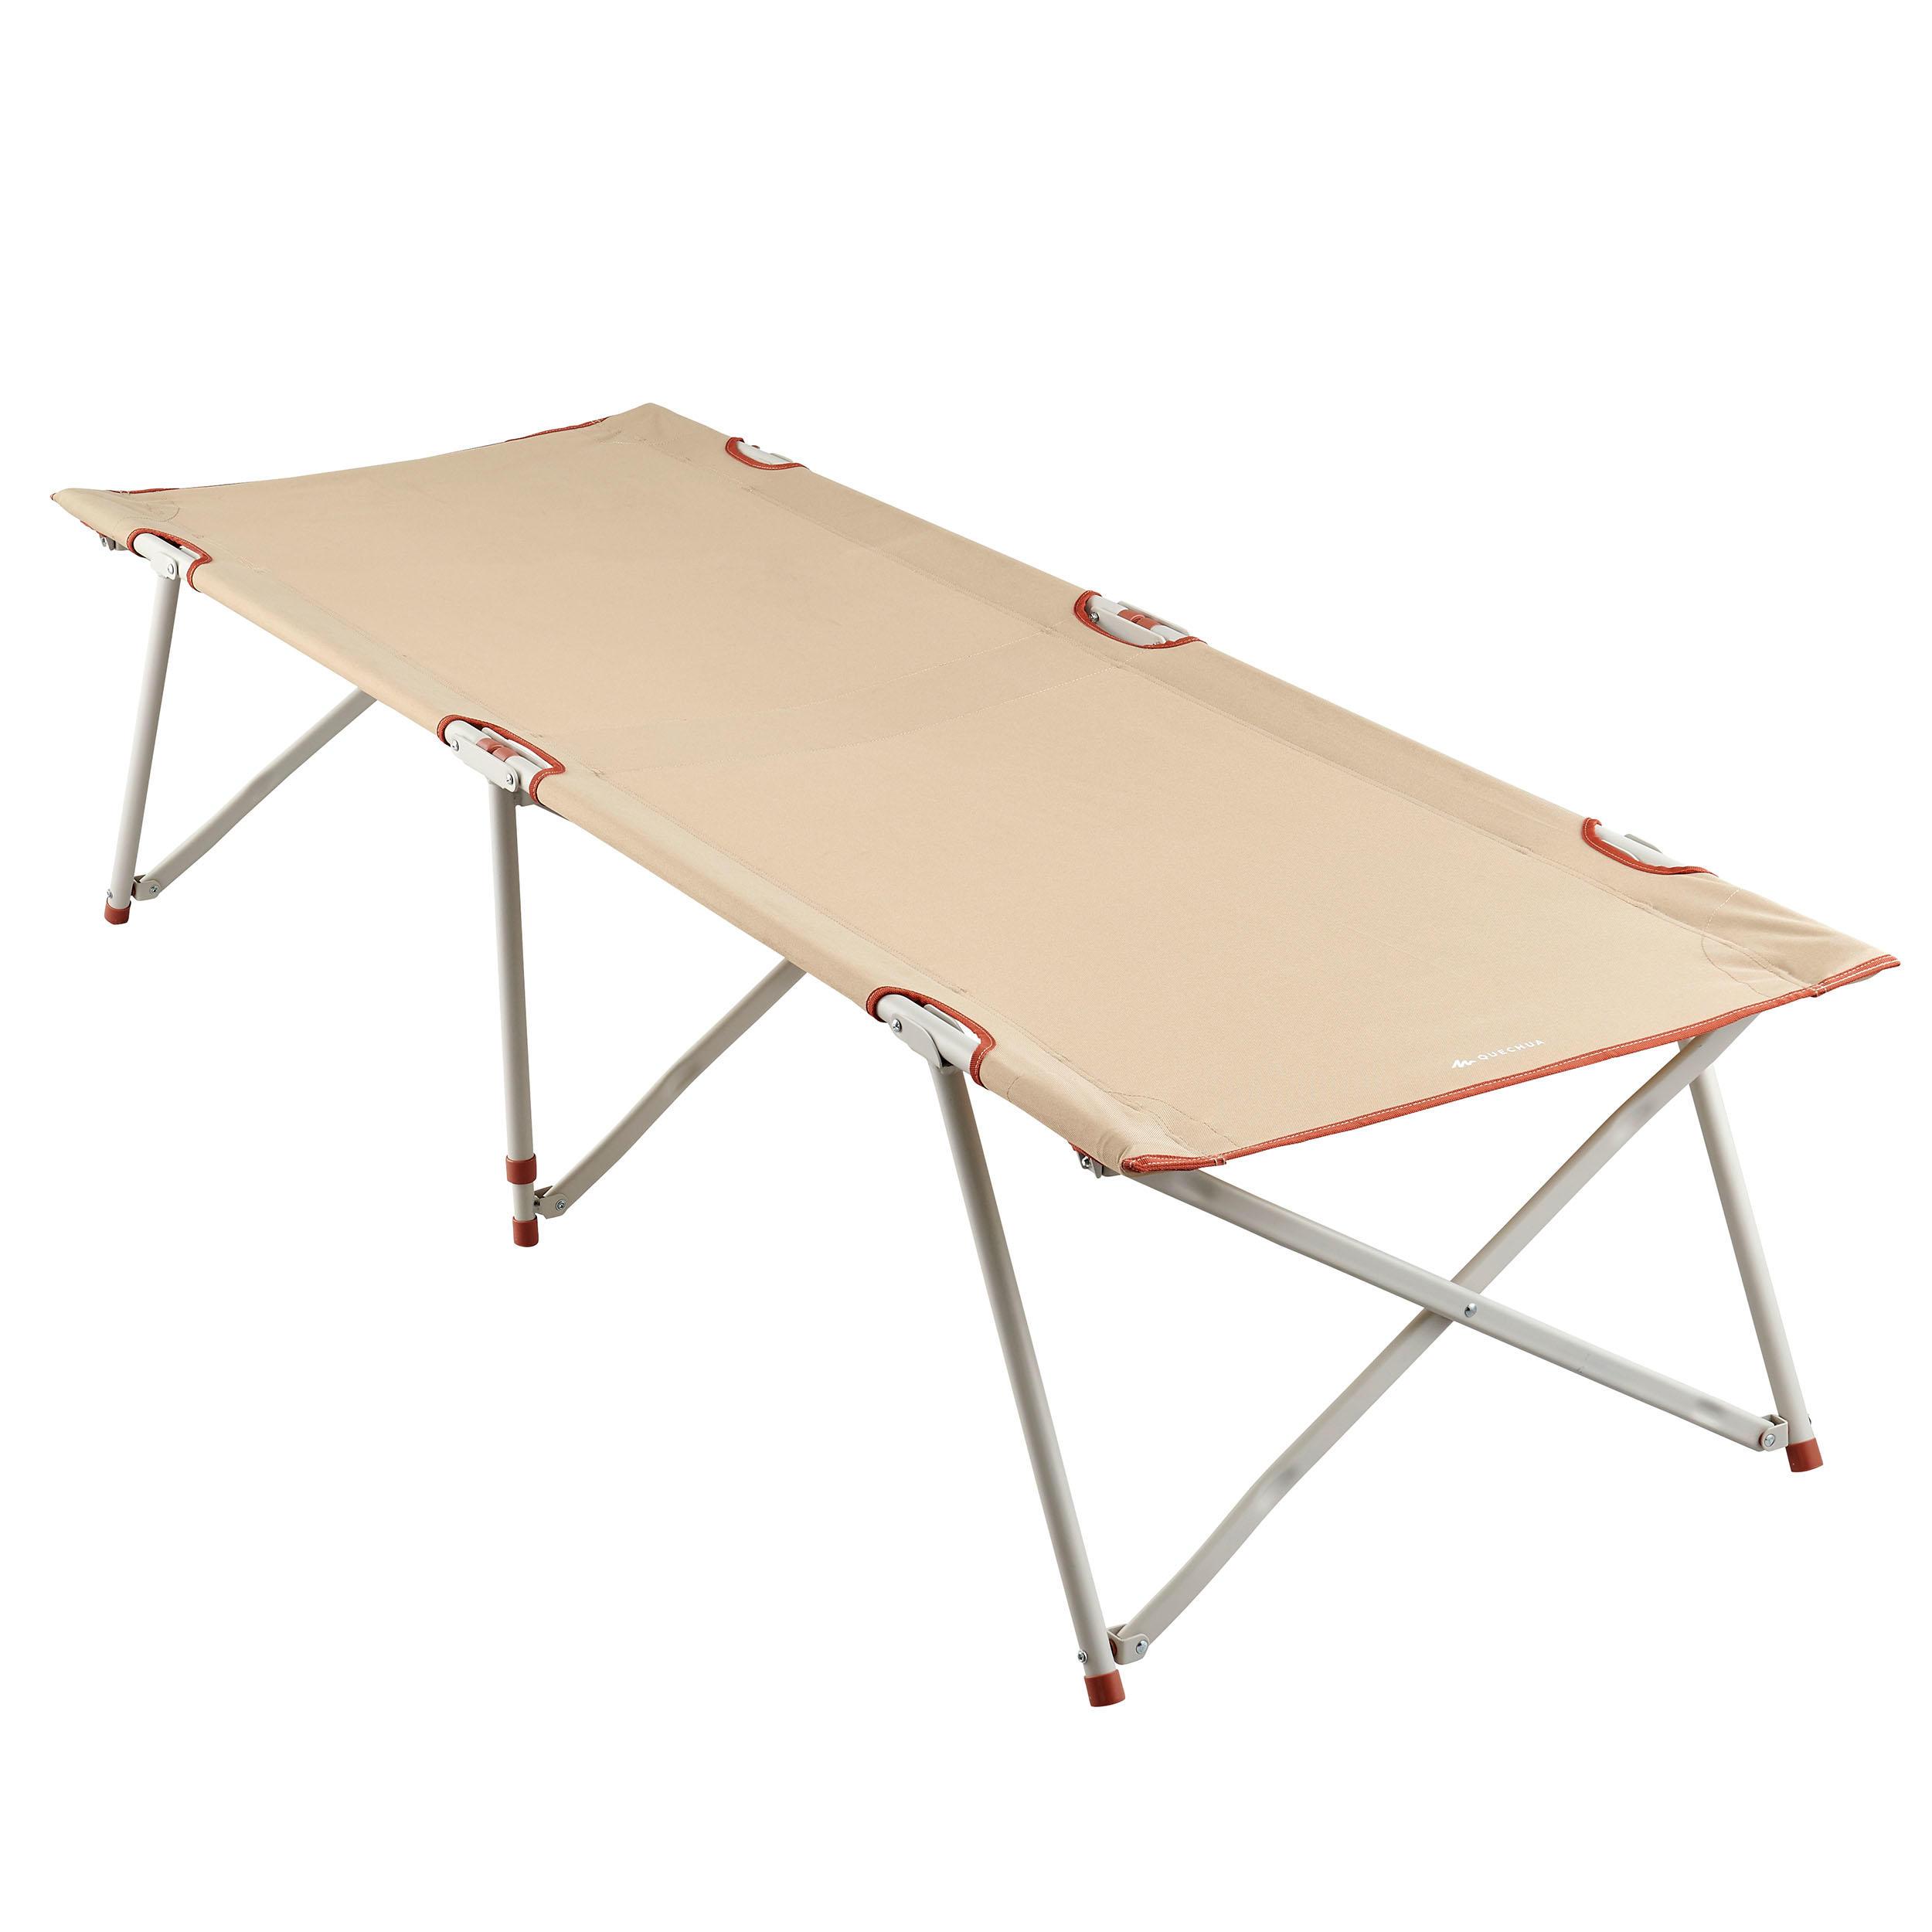 Pat camping Second - 65 cm